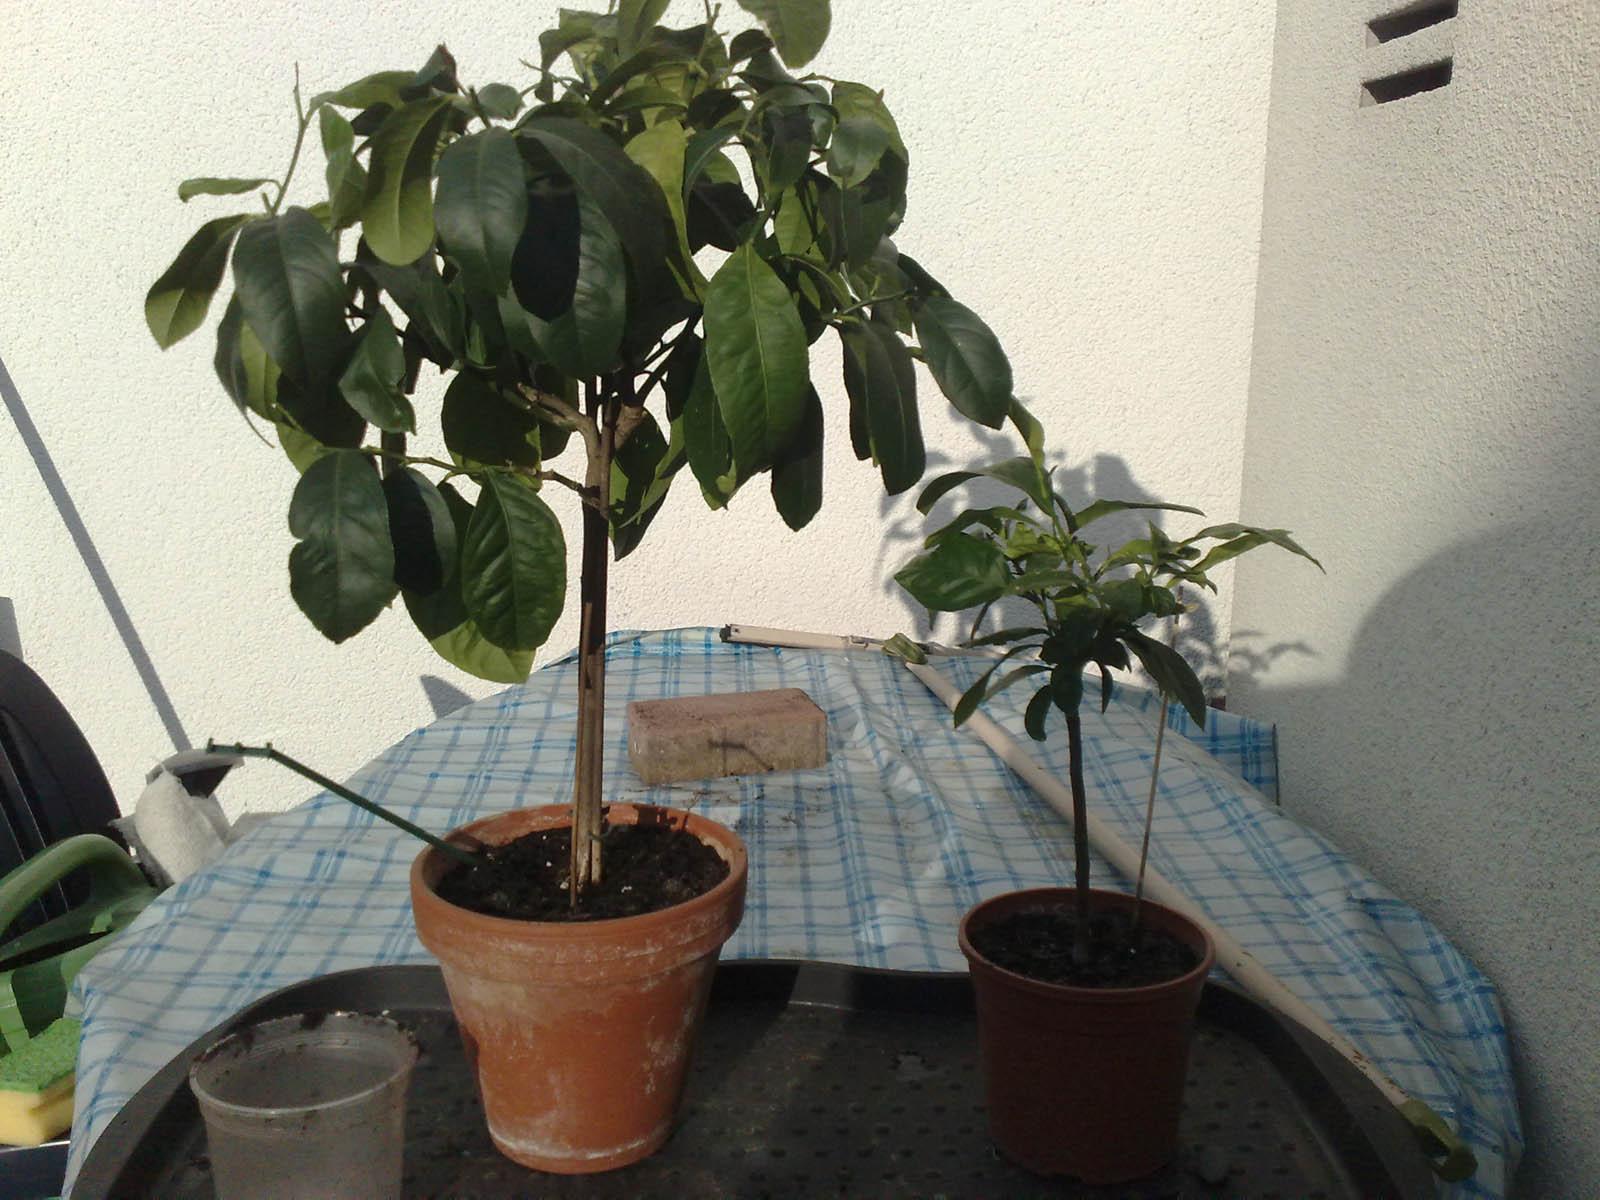 avocado pflanze pflege birkenfeige ficus benjamina verliert bl tter pflege. Black Bedroom Furniture Sets. Home Design Ideas